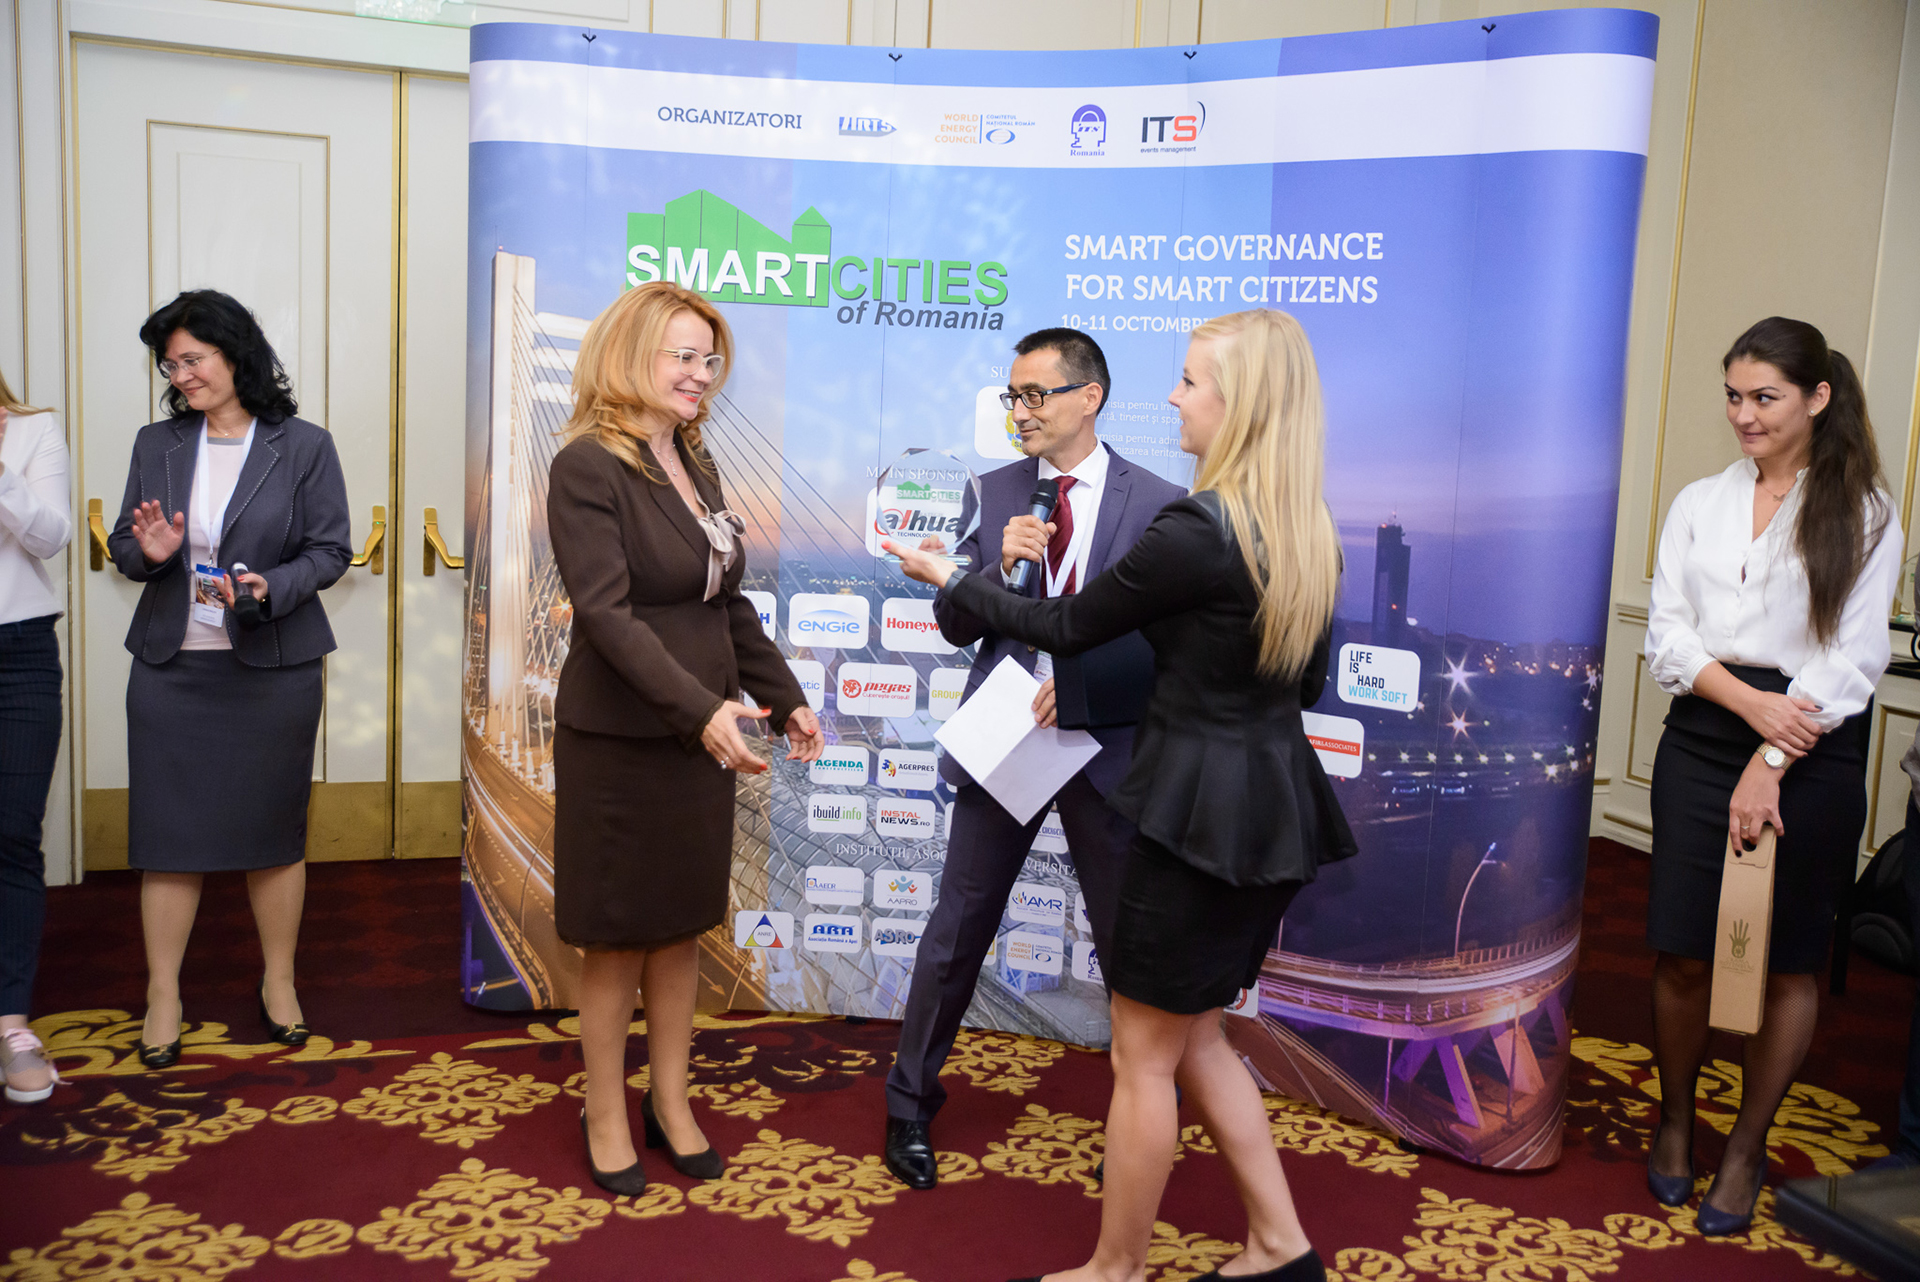 Smart-Cities-Of-Romania-2017---ITS-690